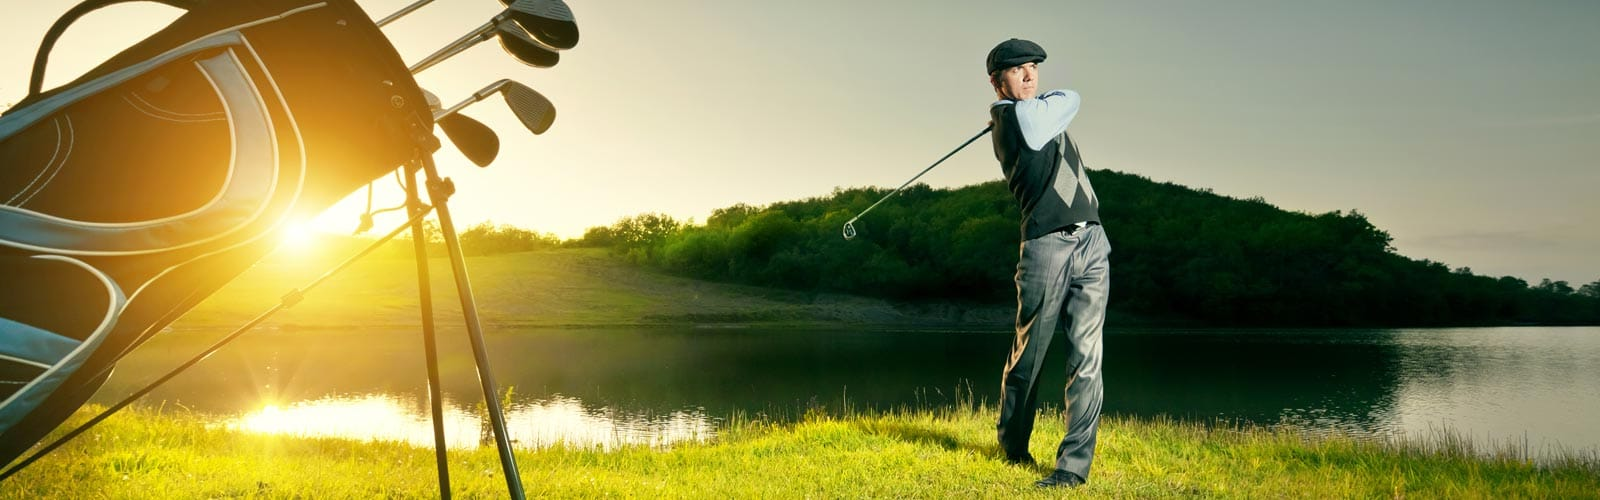 Golf Club Specs